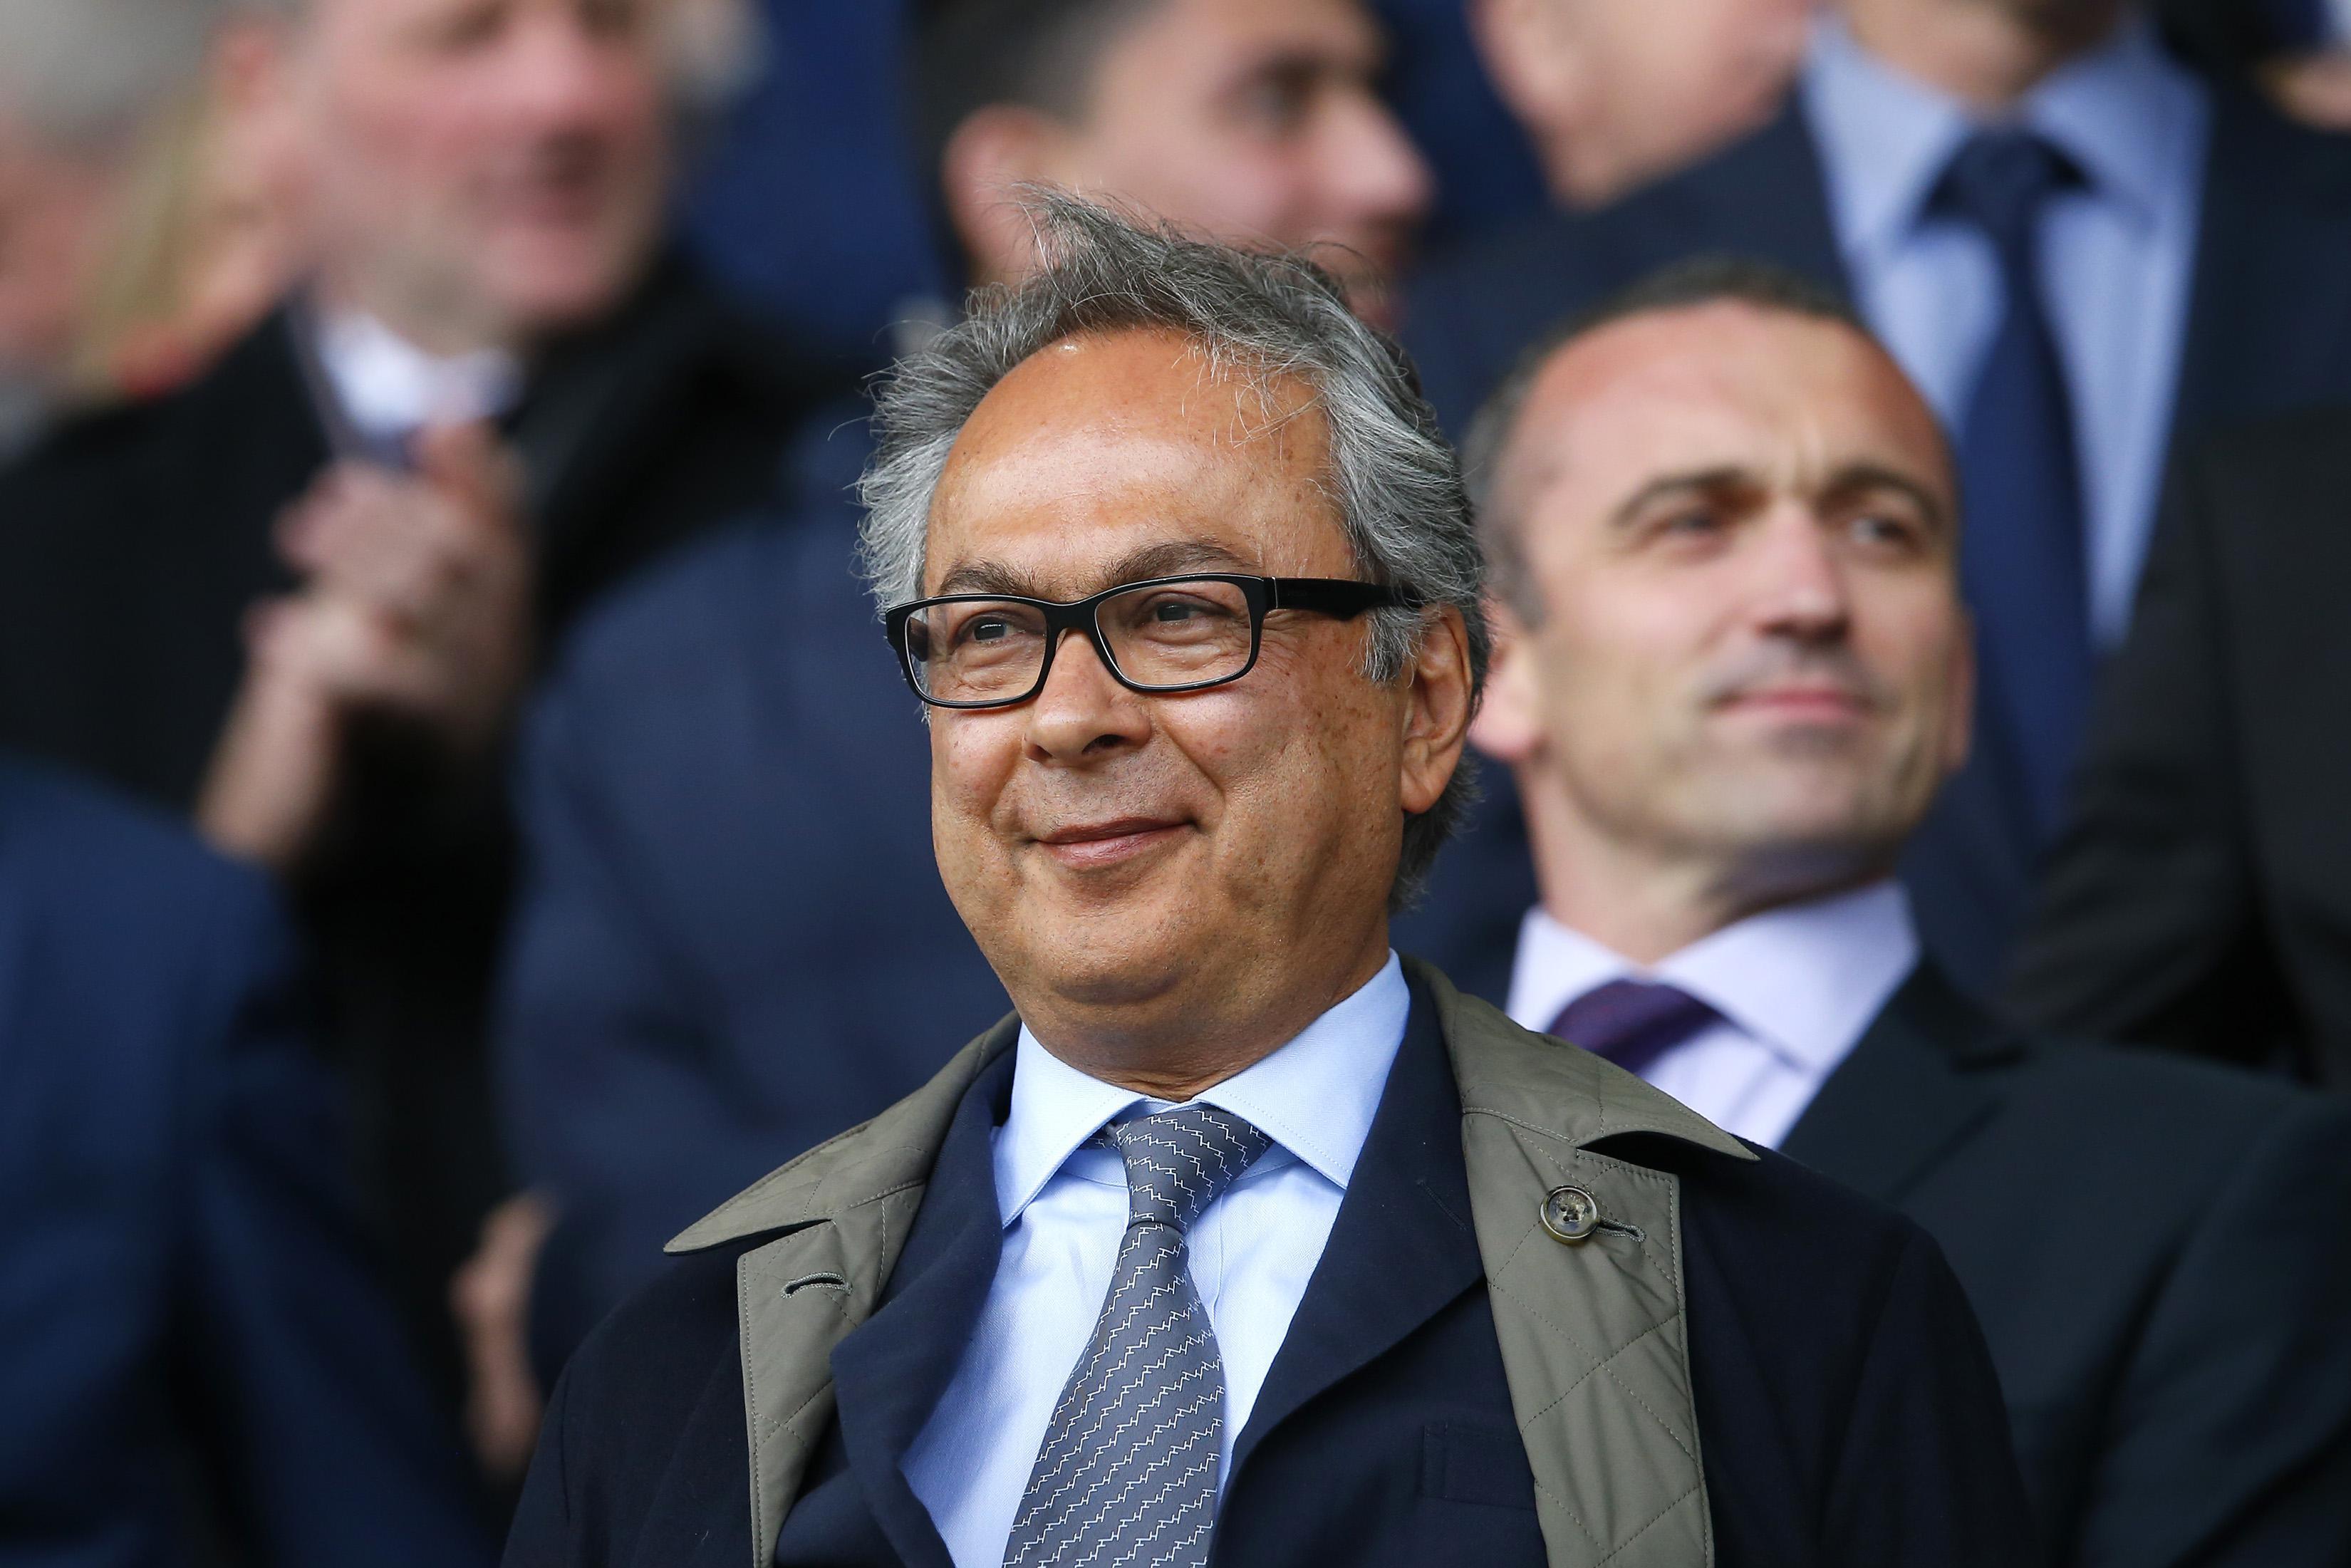 Everton owner Farhad Moshiri would love to bring him to Goodison